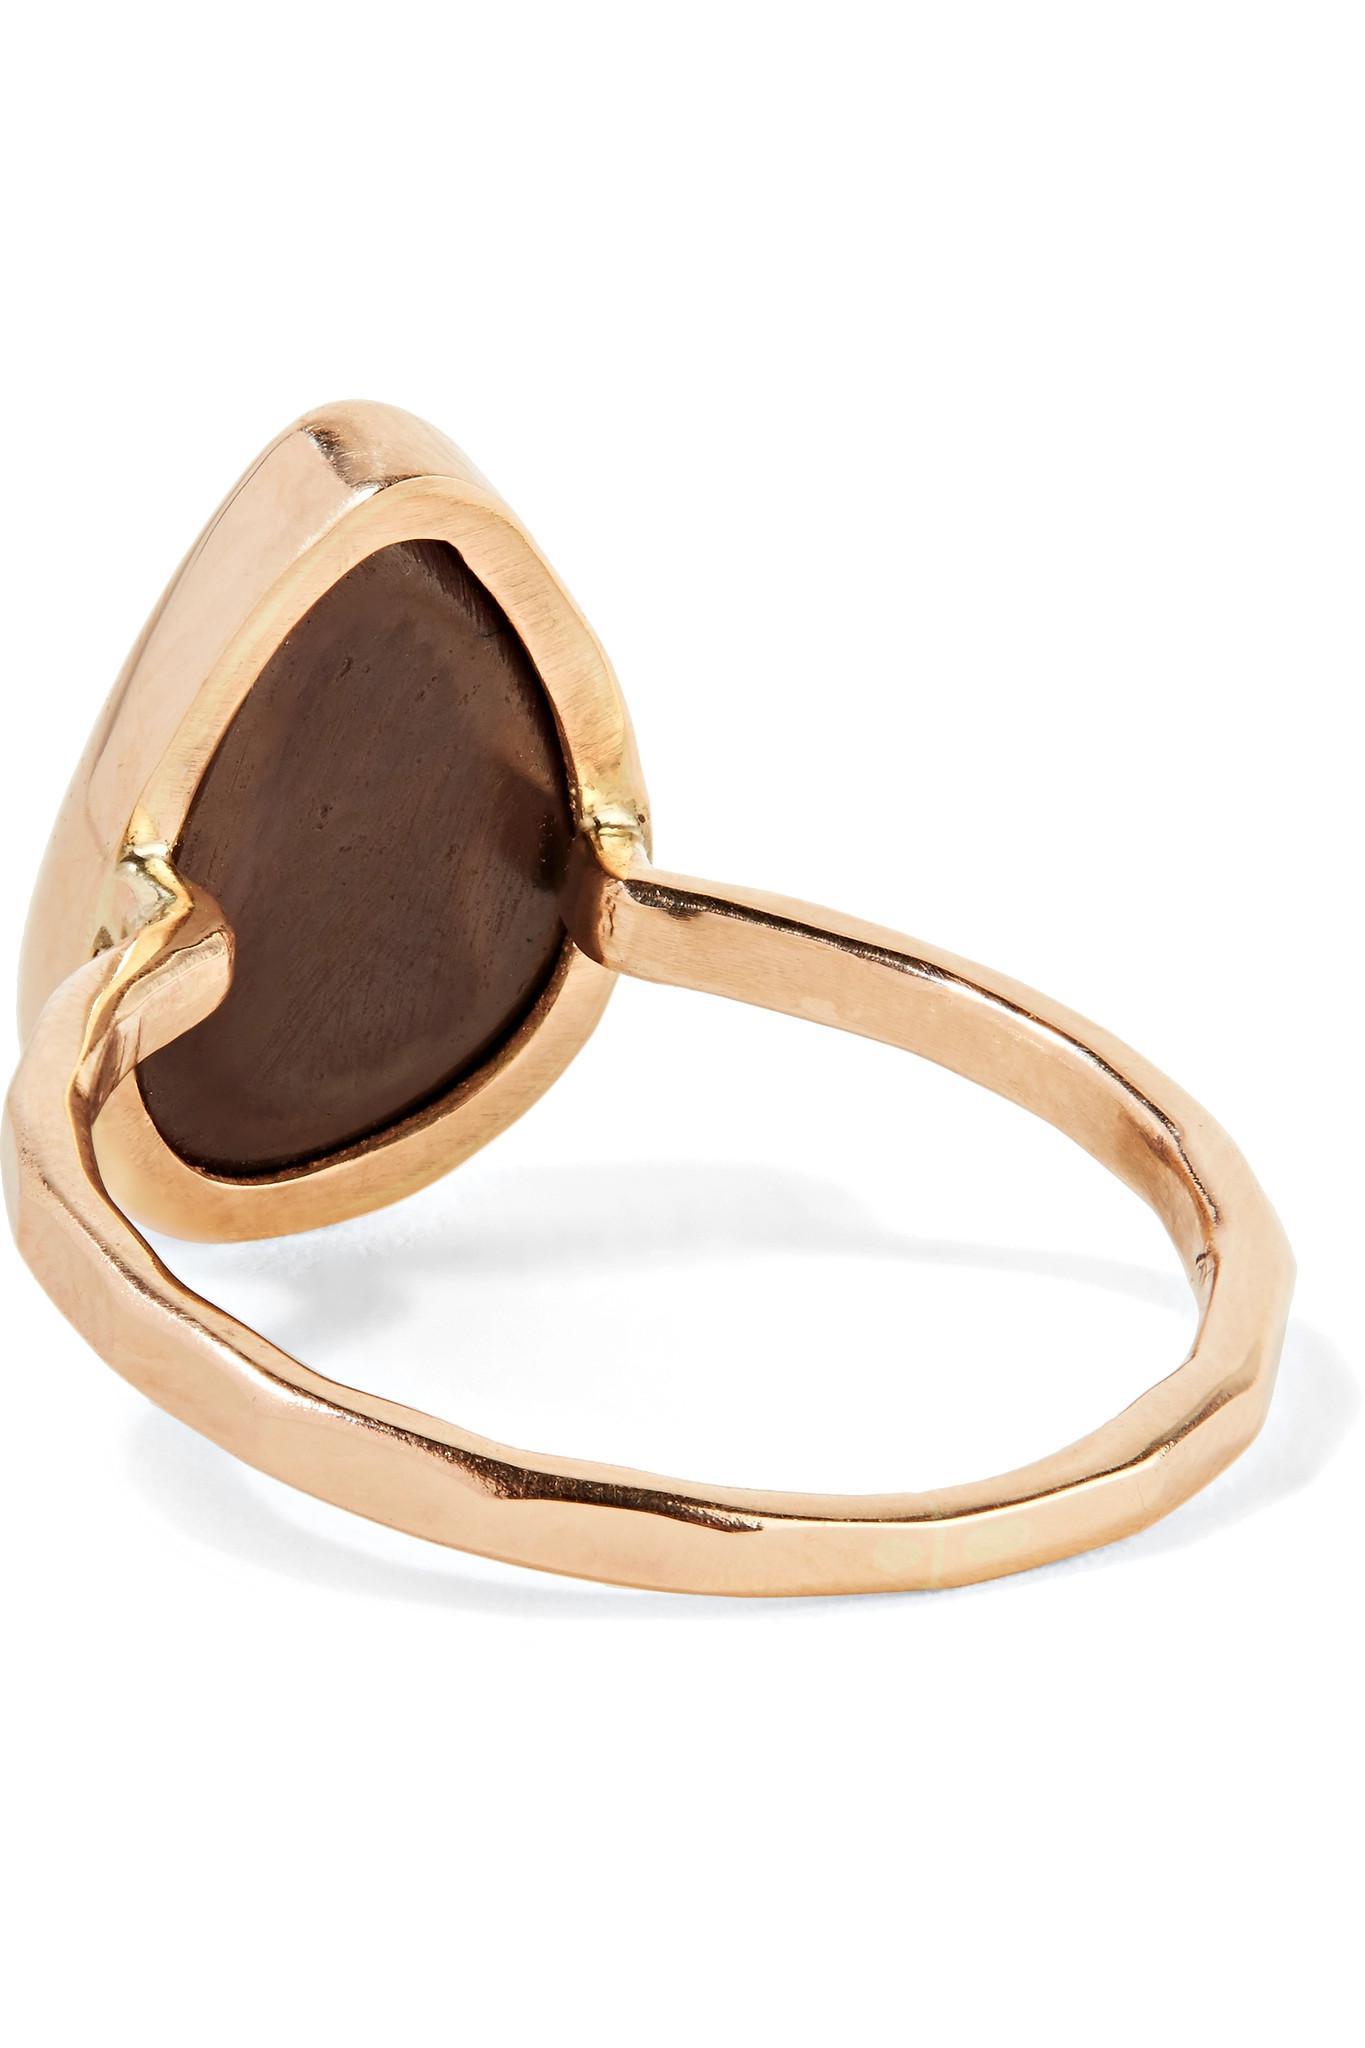 14-karat Gold, Quartz And Rhodochrosite Ring - 6 Melissa Joy Manning